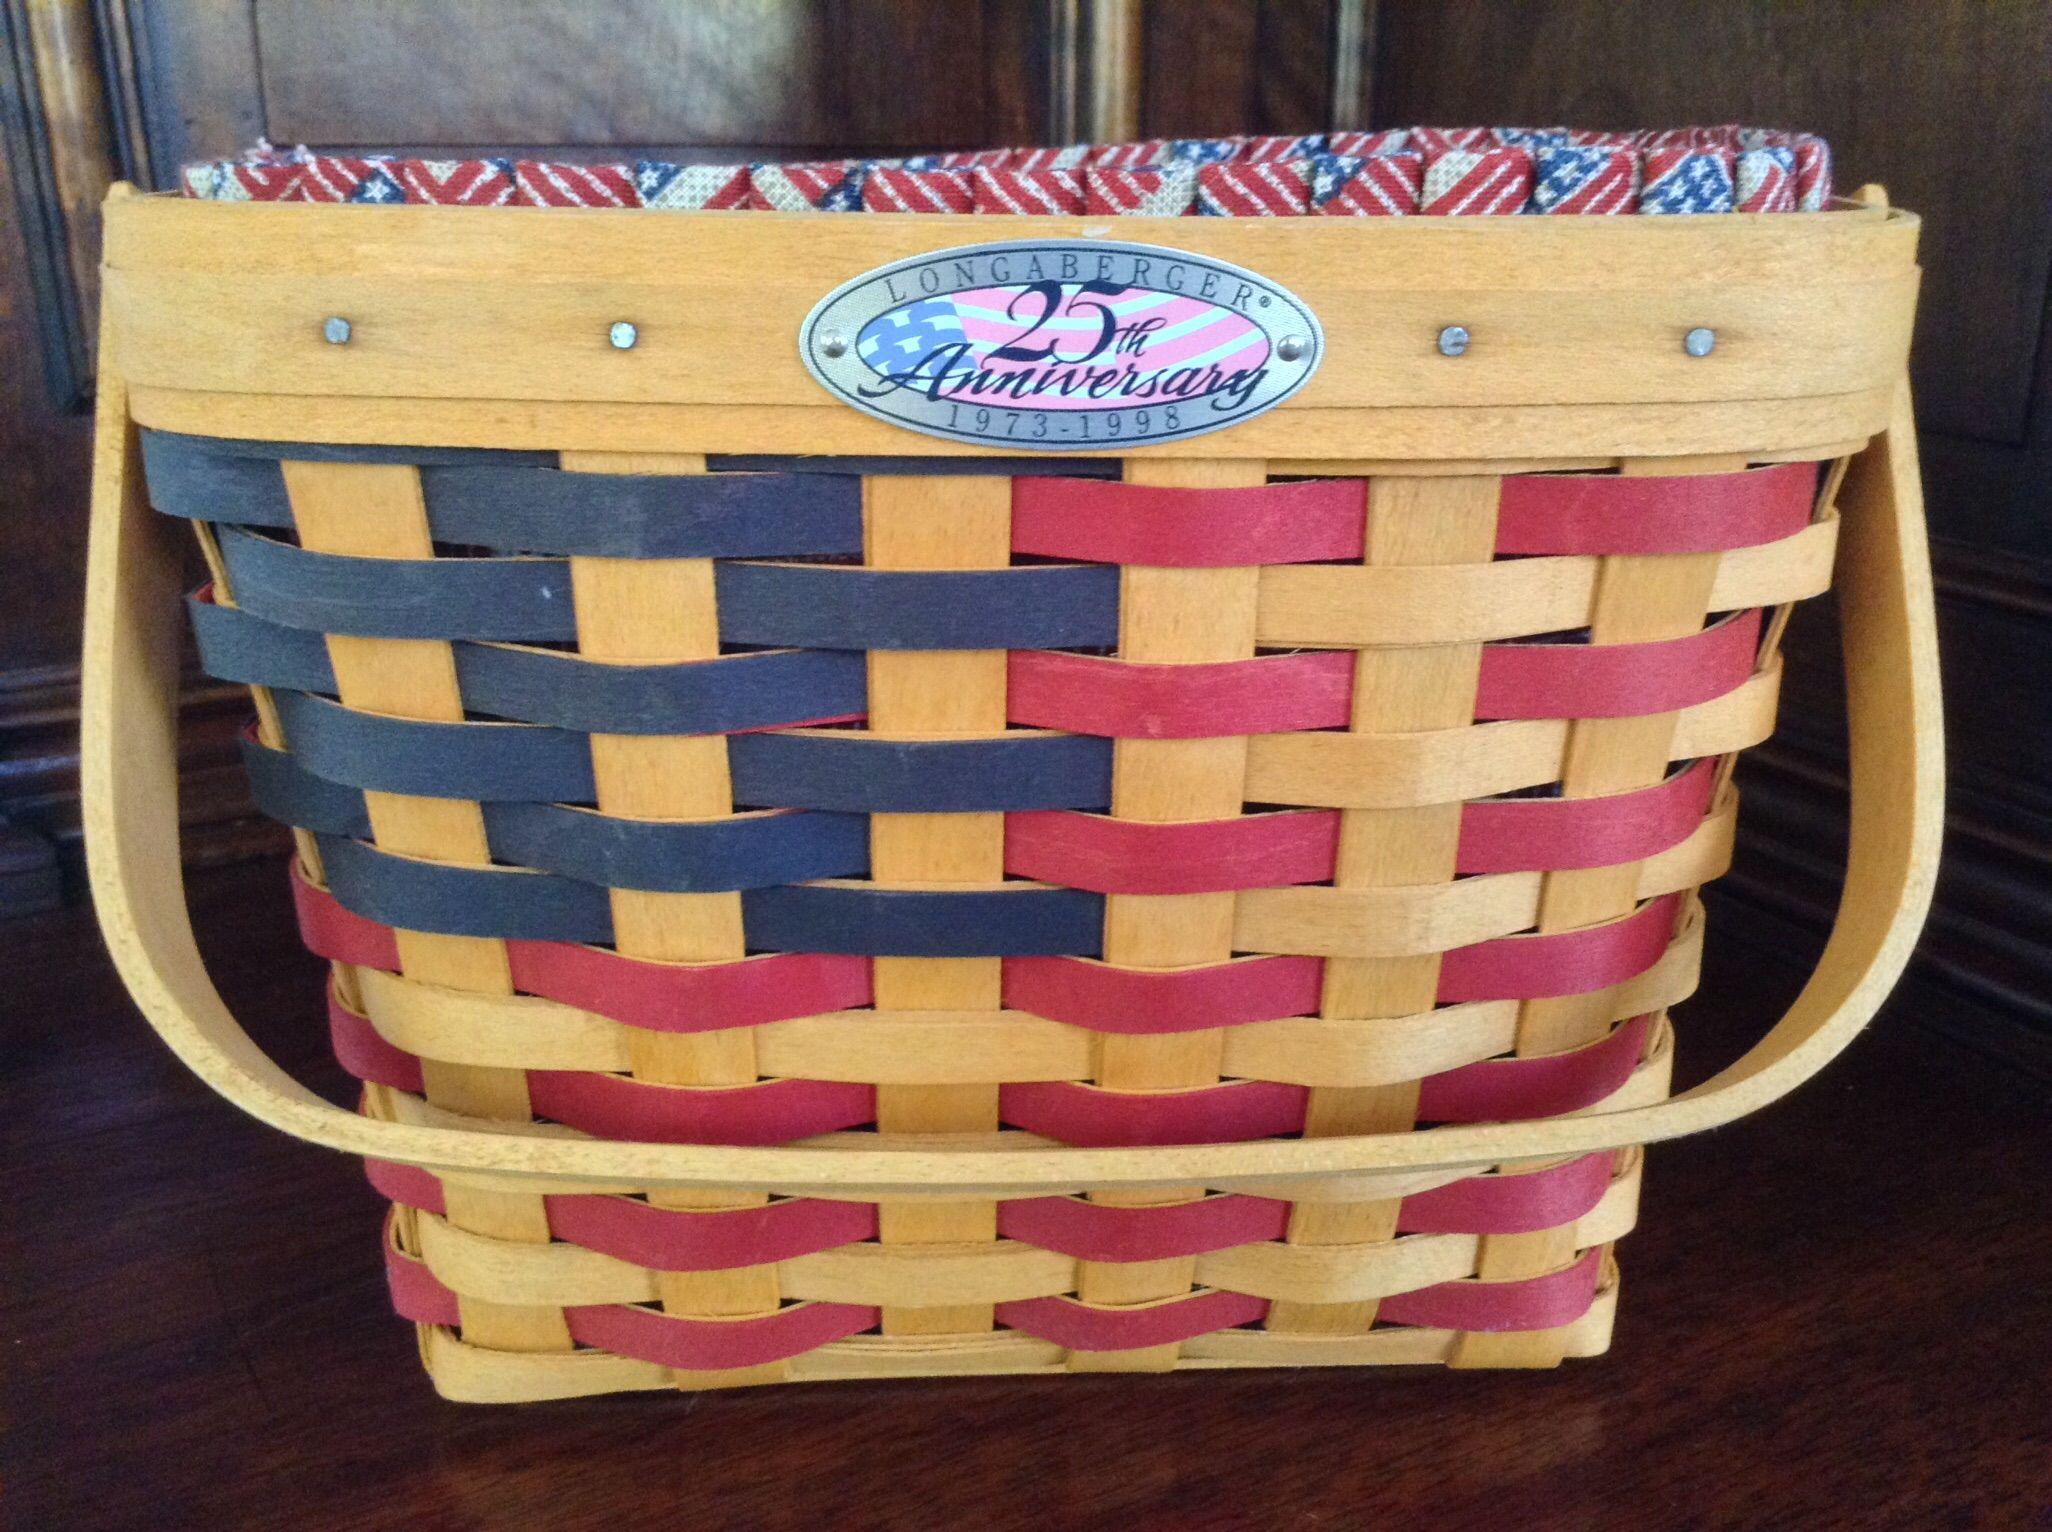 Longaberger 25th Anniversary Basket